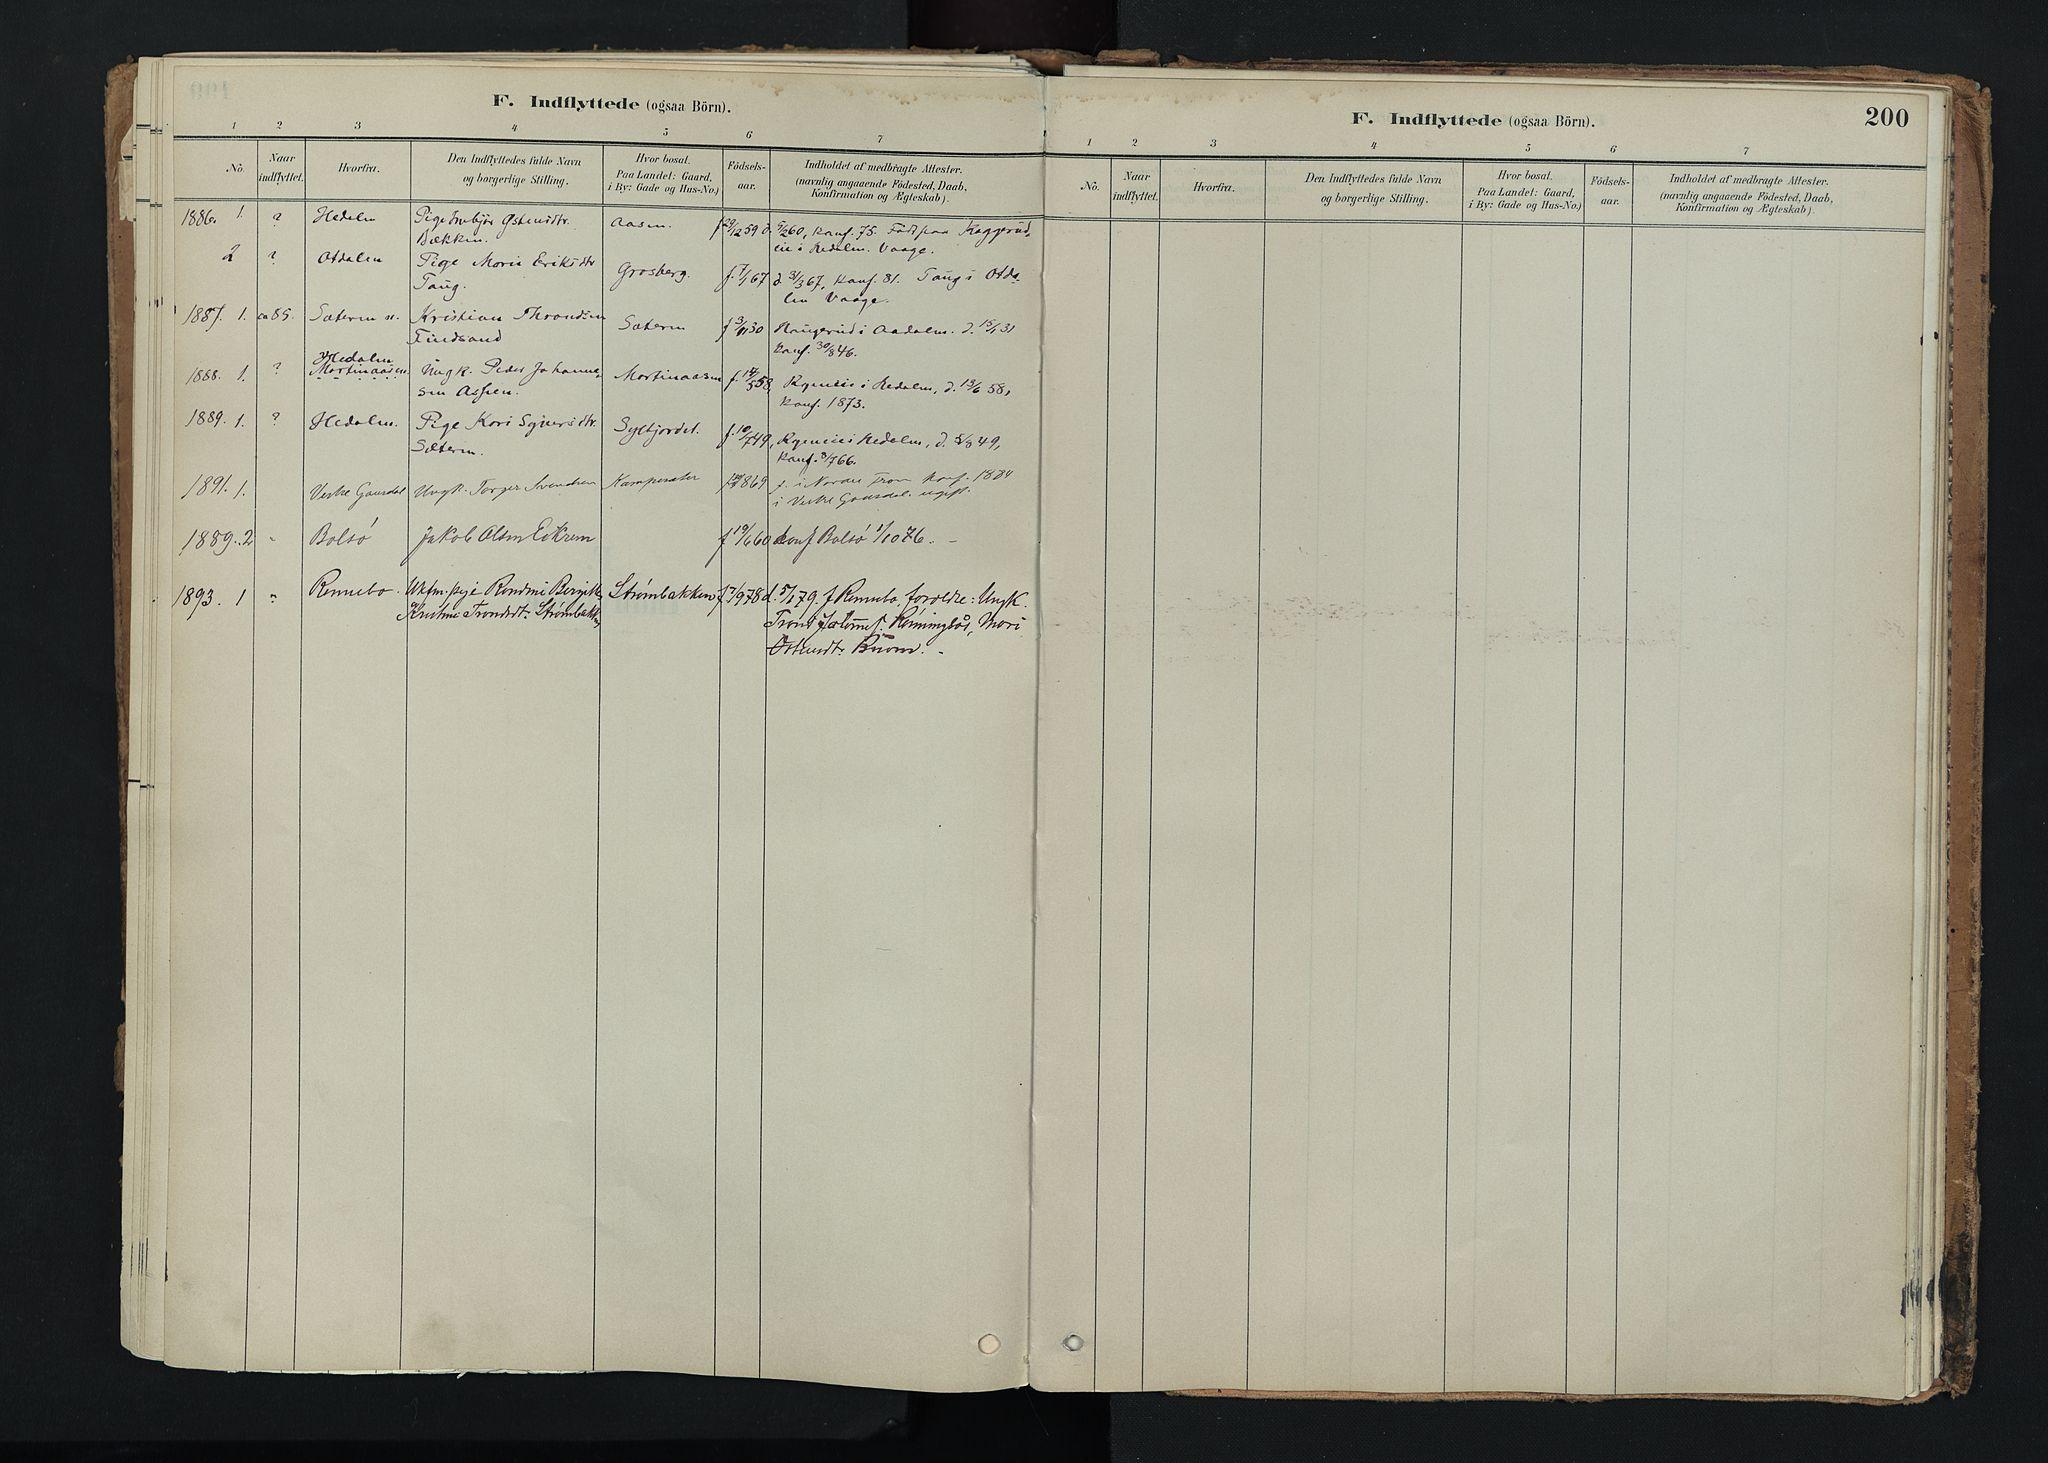 SAH, Nord-Fron prestekontor, Ministerialbok nr. 5, 1884-1914, s. 200